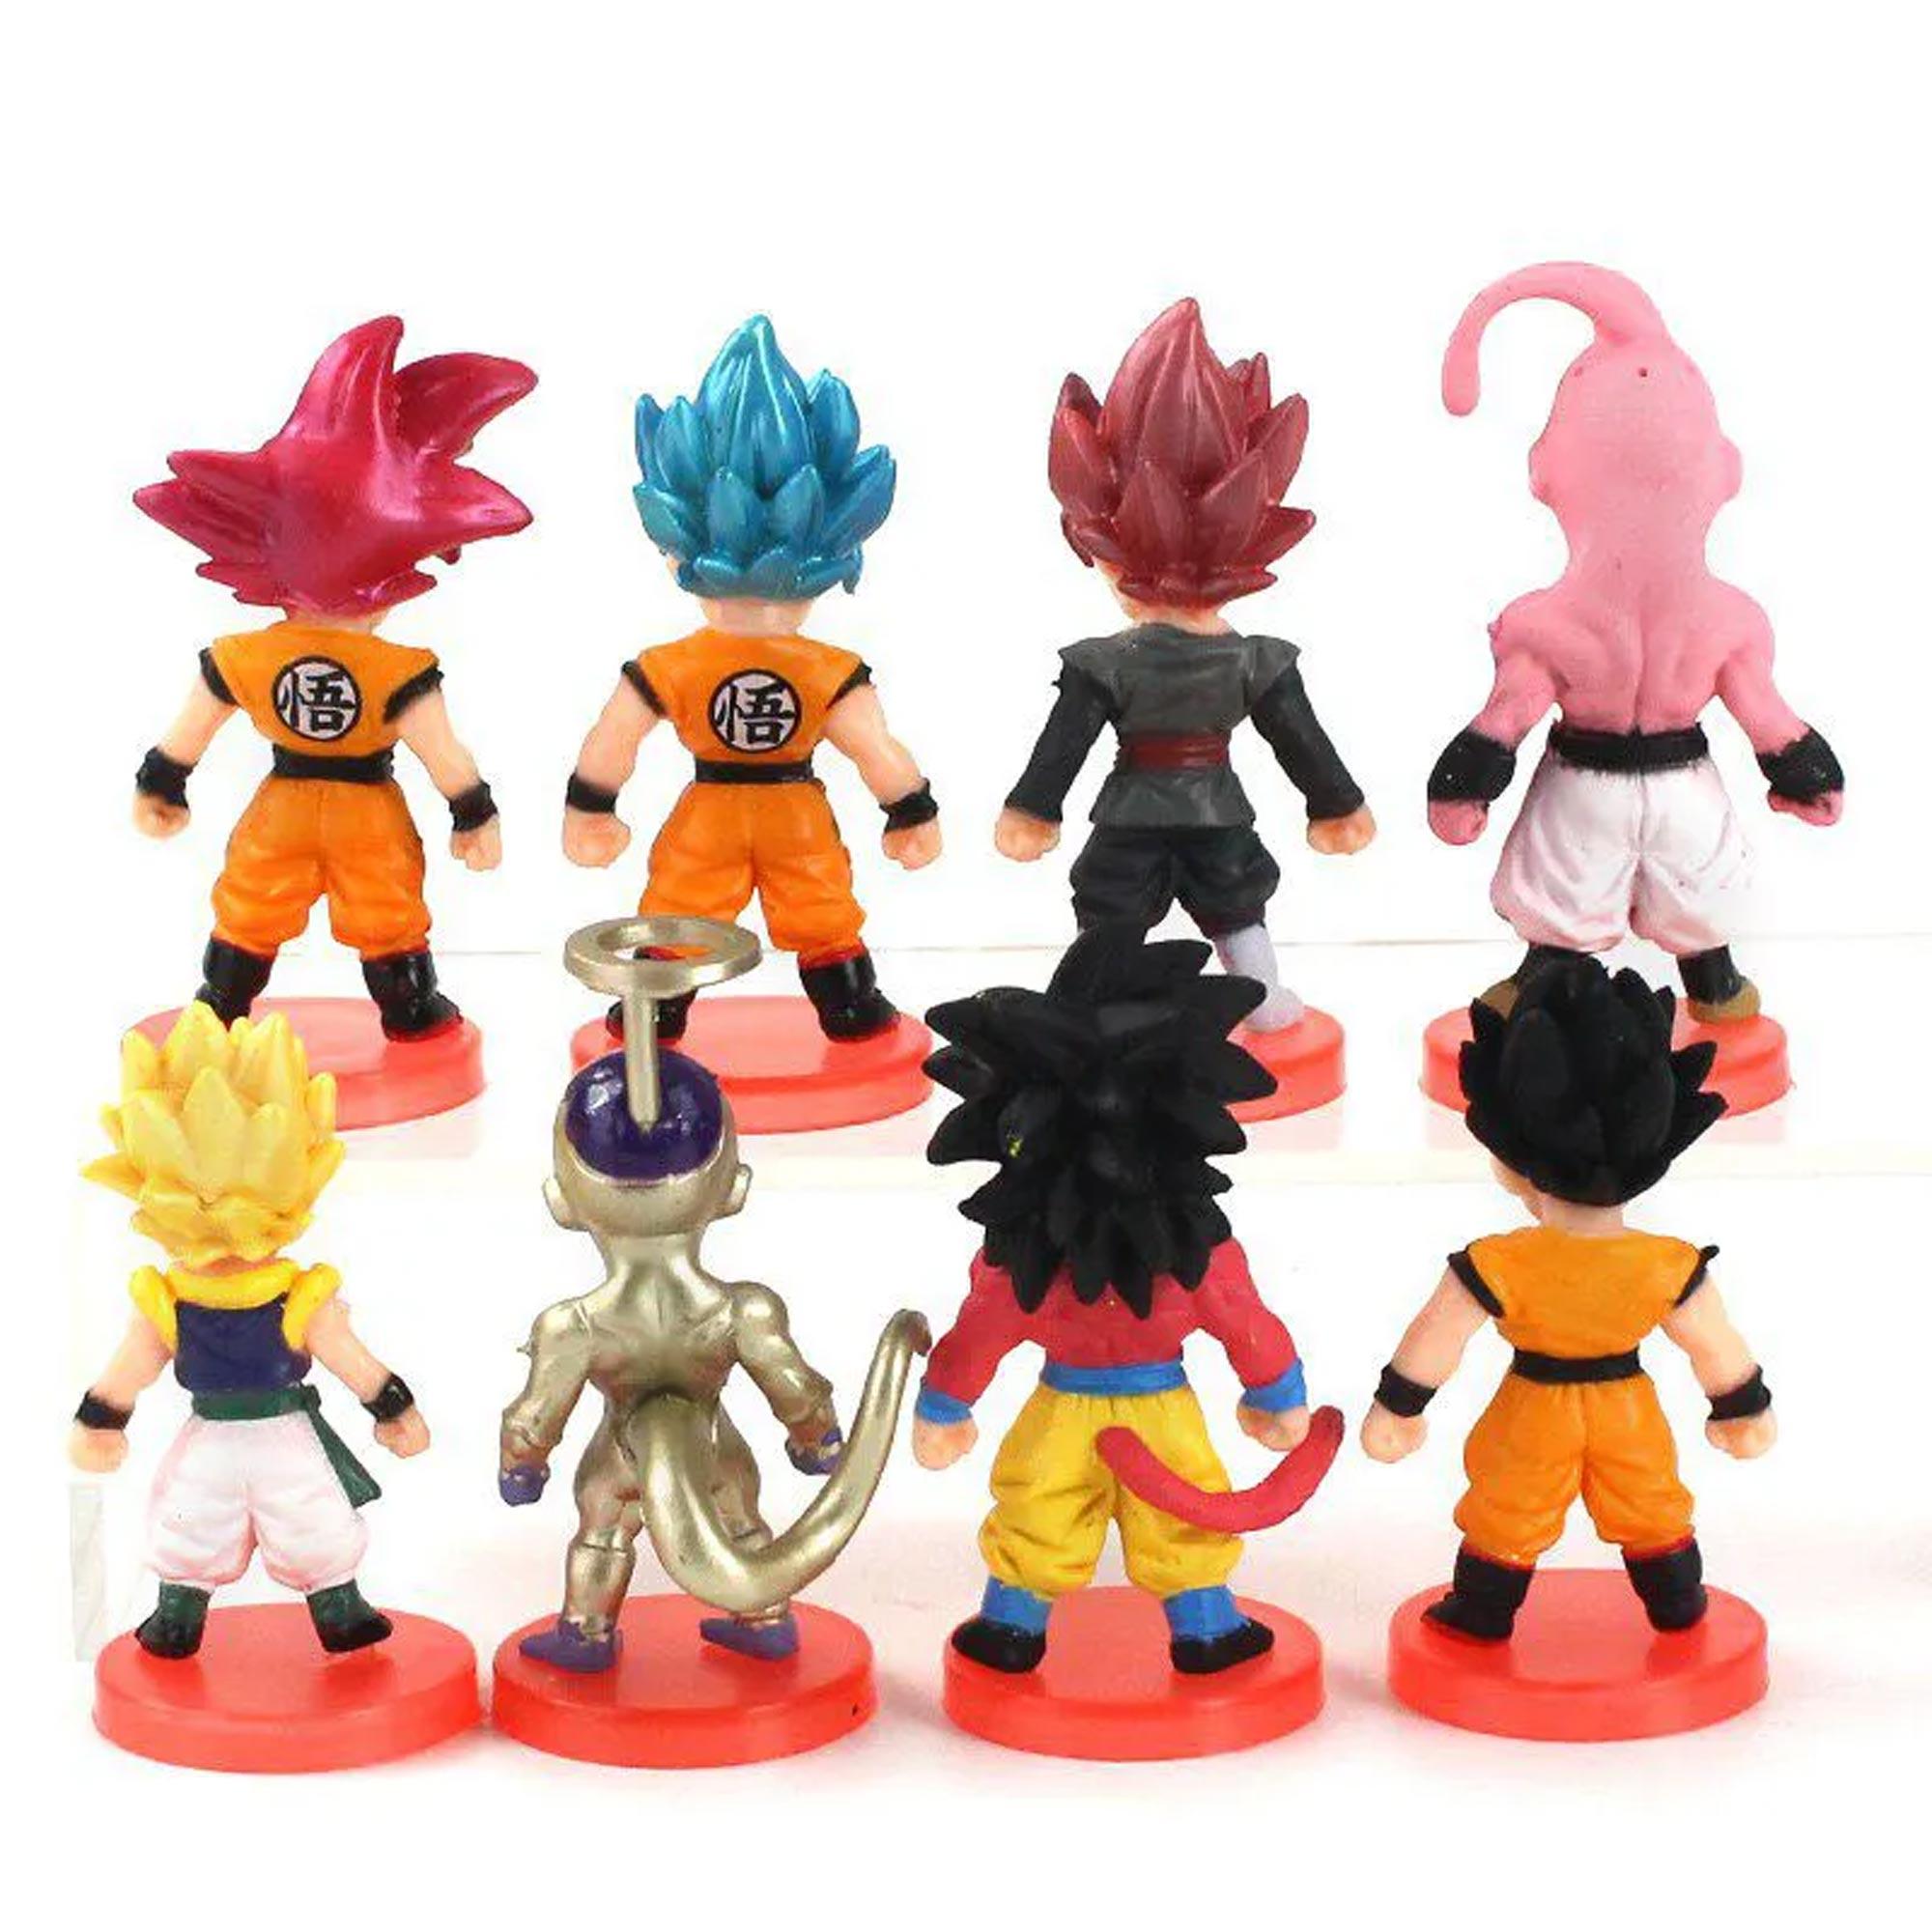 Gotenks - Dragon Ball Z